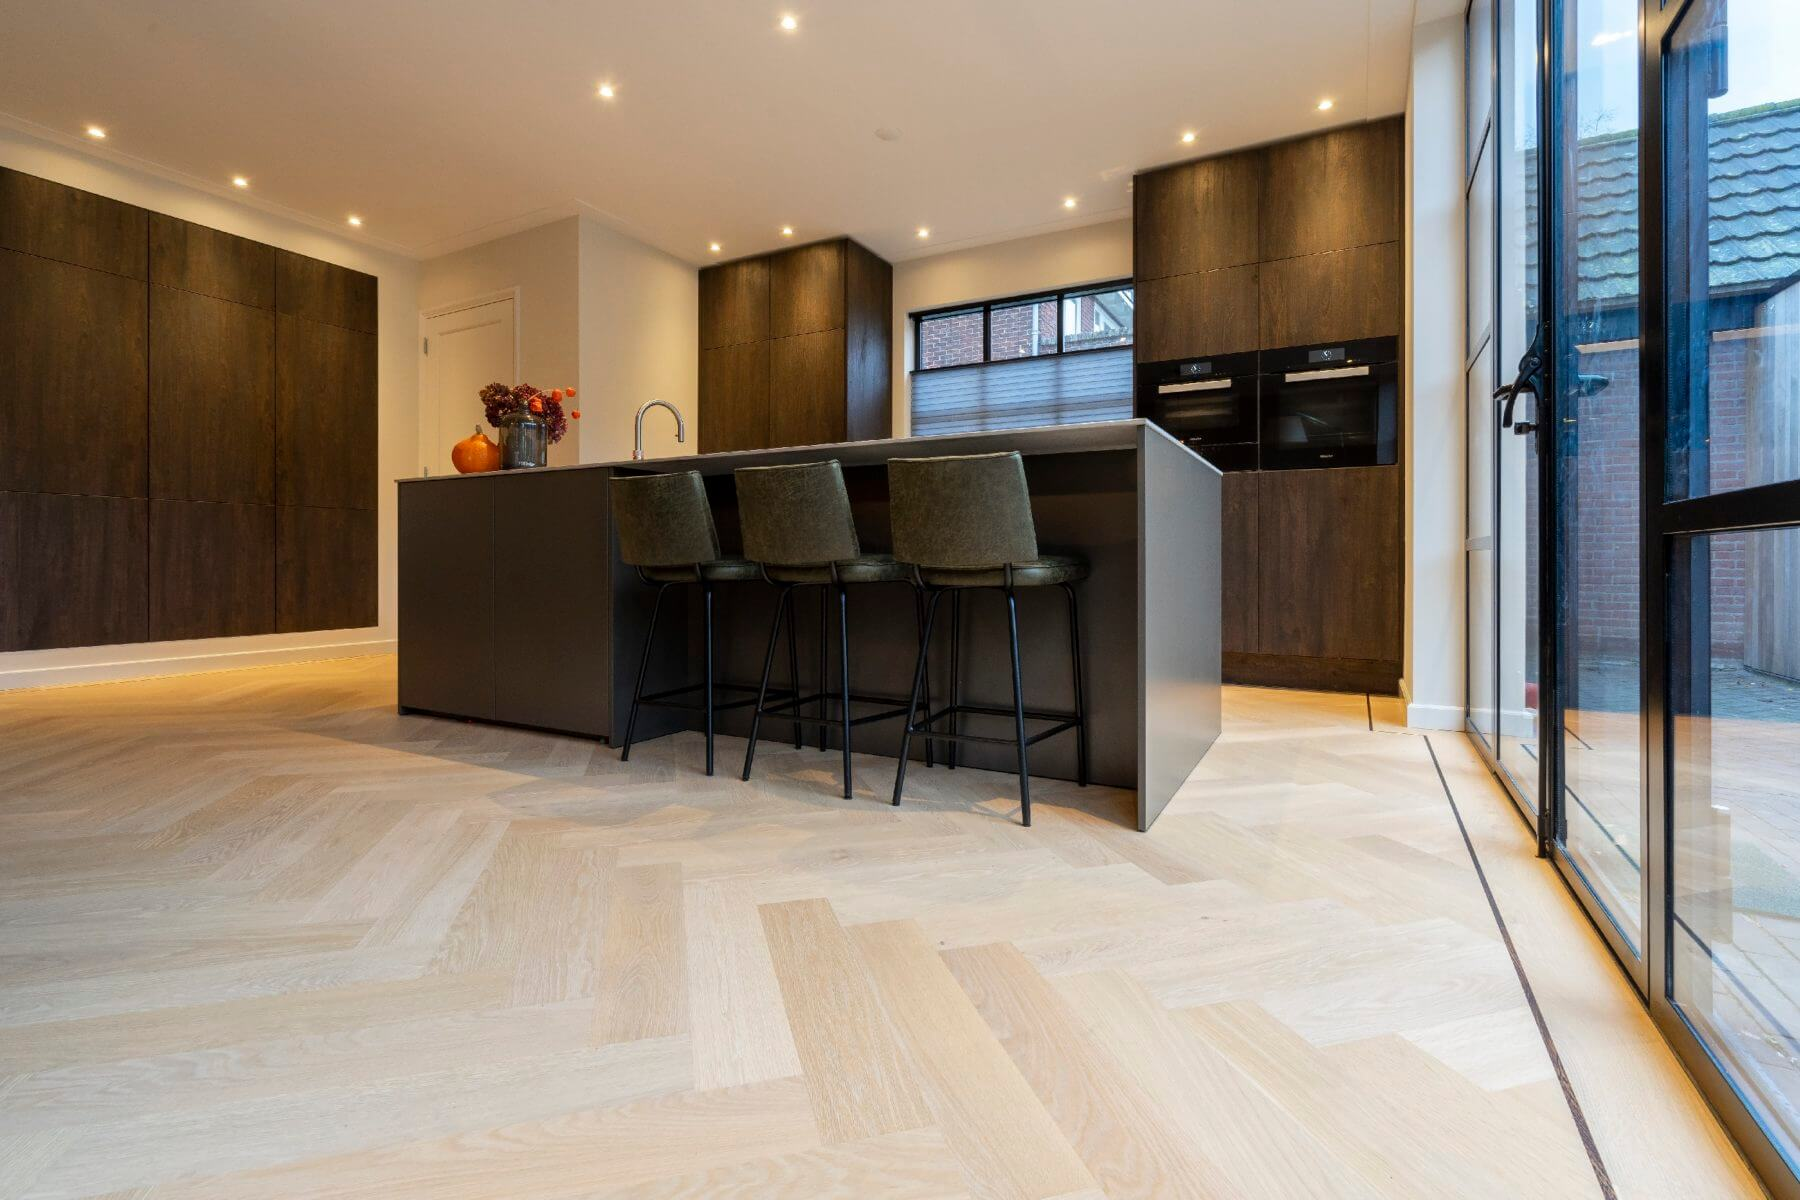 Eikenhouten Visgraat Vloer : Vloerenhuis amsterdam de parketspecialist sinds